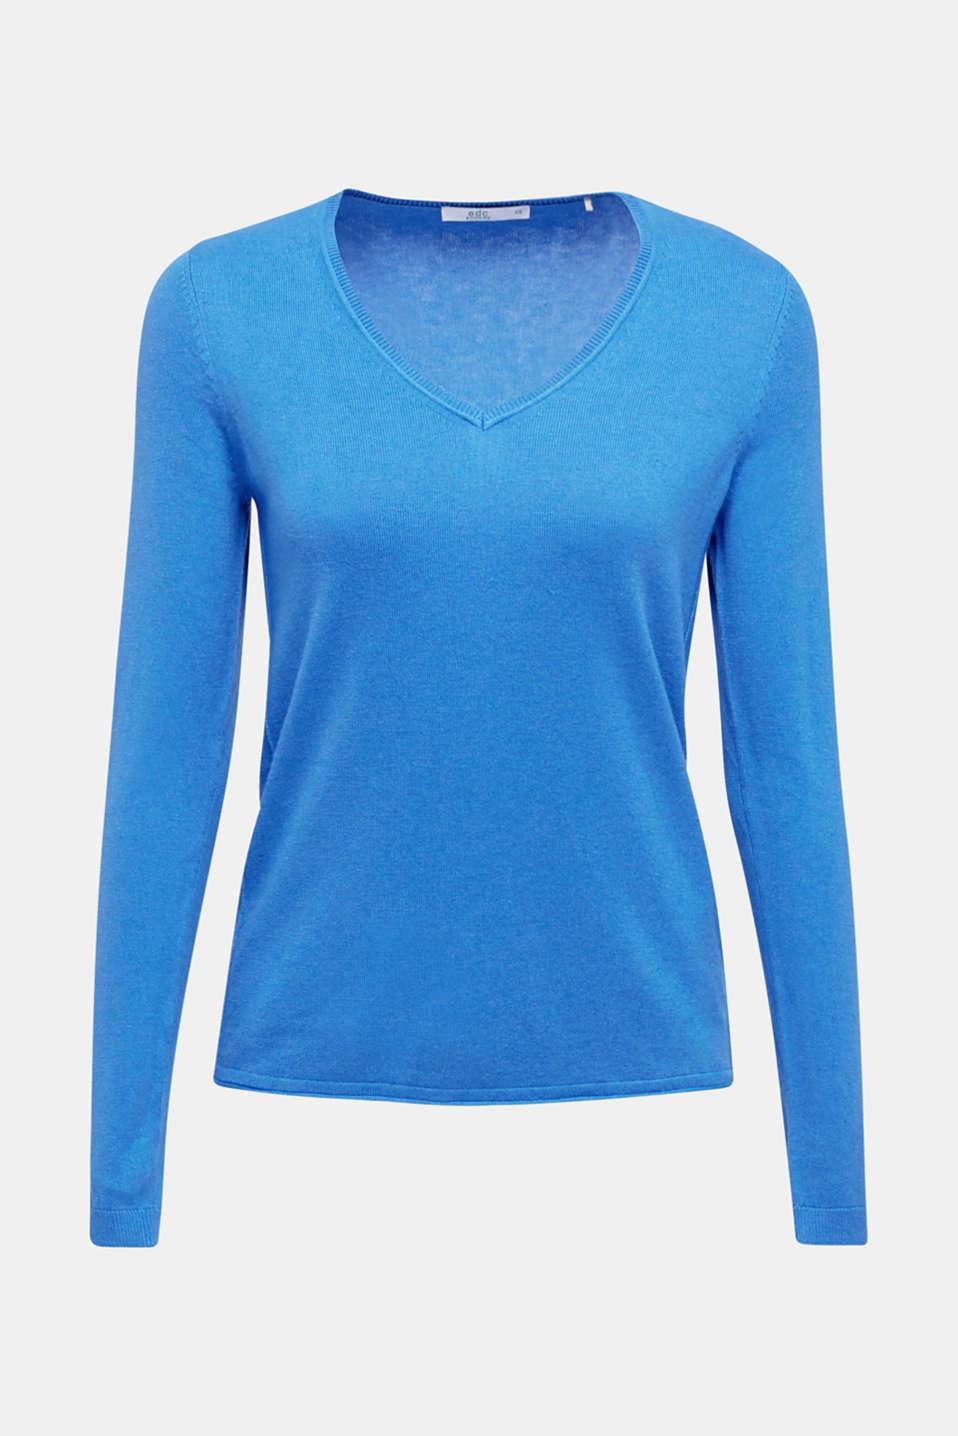 Jumper, organic cotton, BRIGHT BLUE, detail image number 6